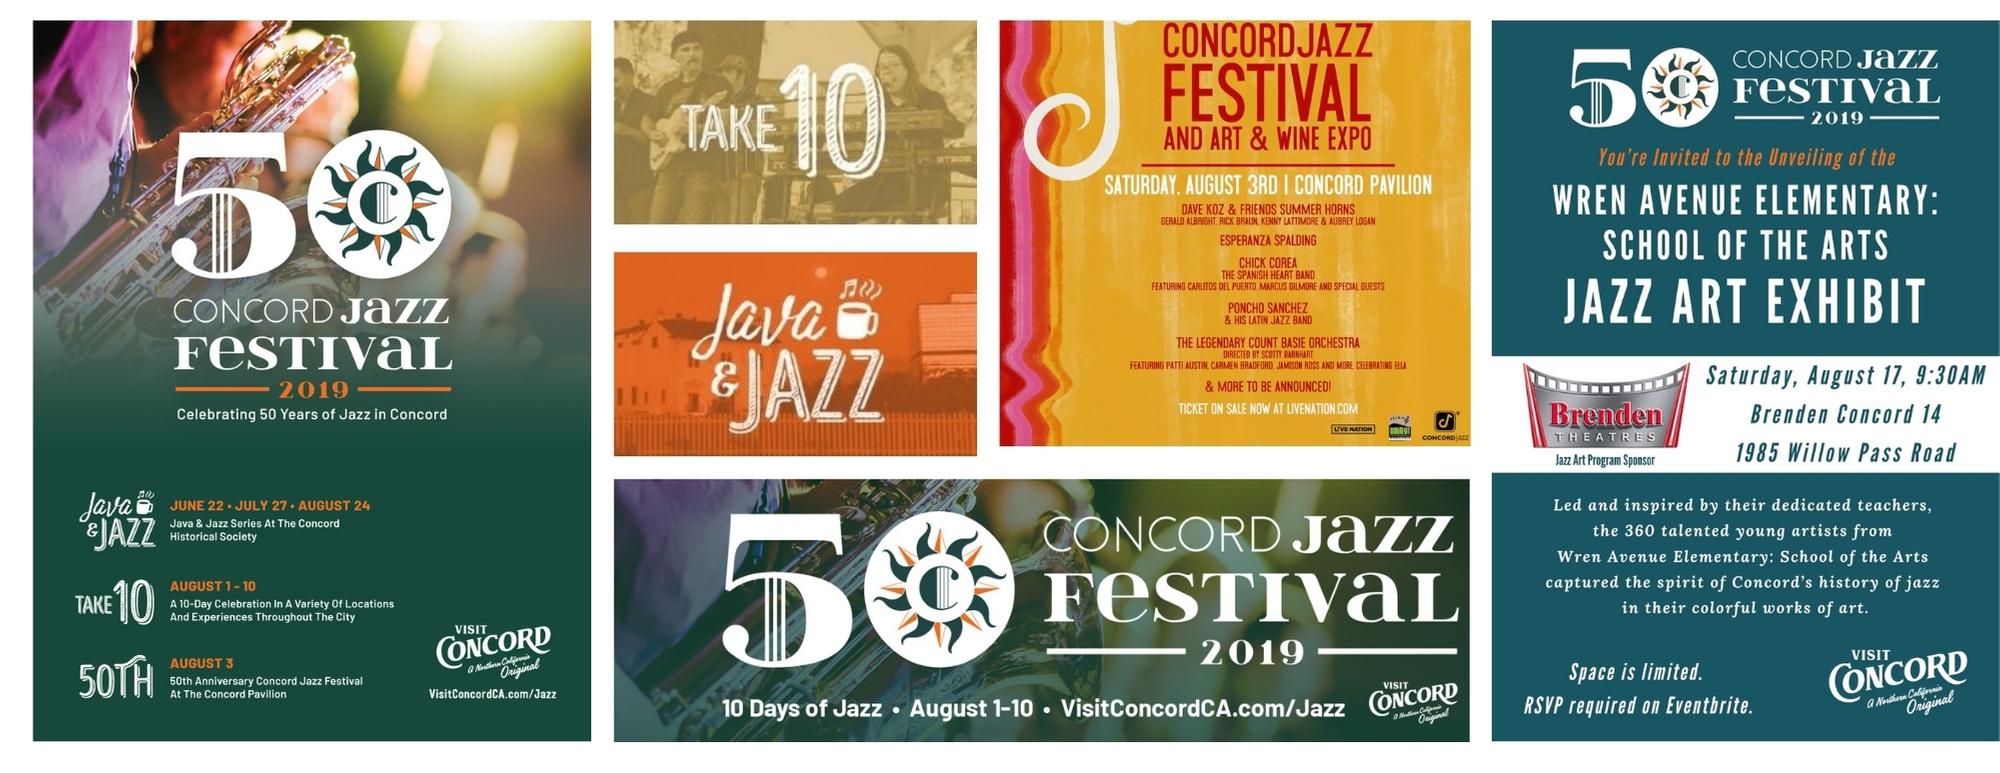 Concord Jazz Festival